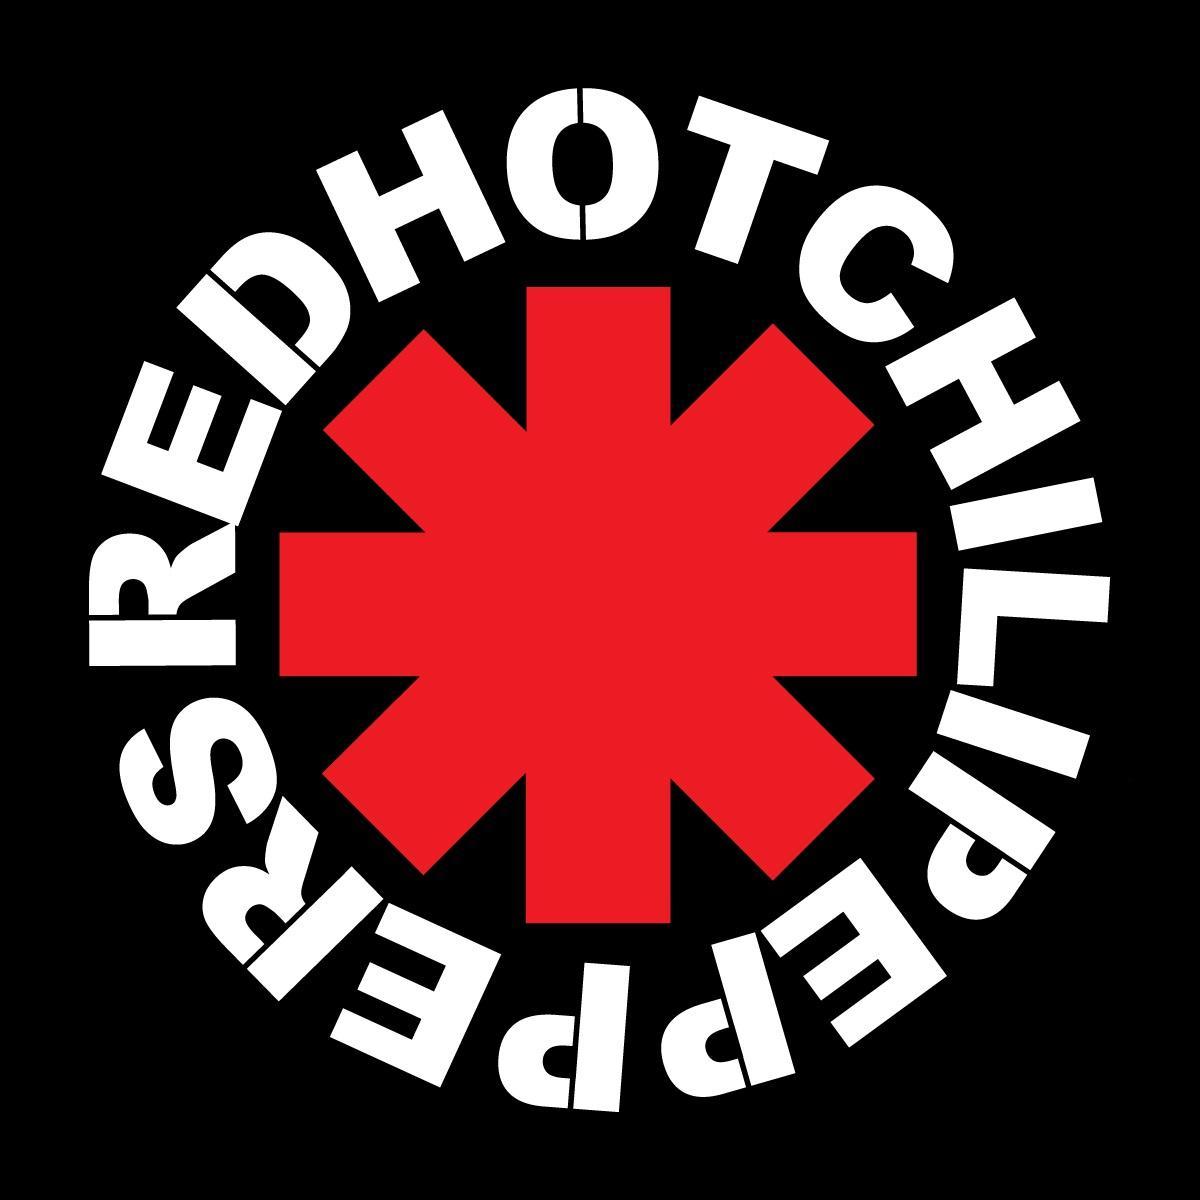 red hot chili peppers discography 1984 2016 alternative download for free via torrent. Black Bedroom Furniture Sets. Home Design Ideas